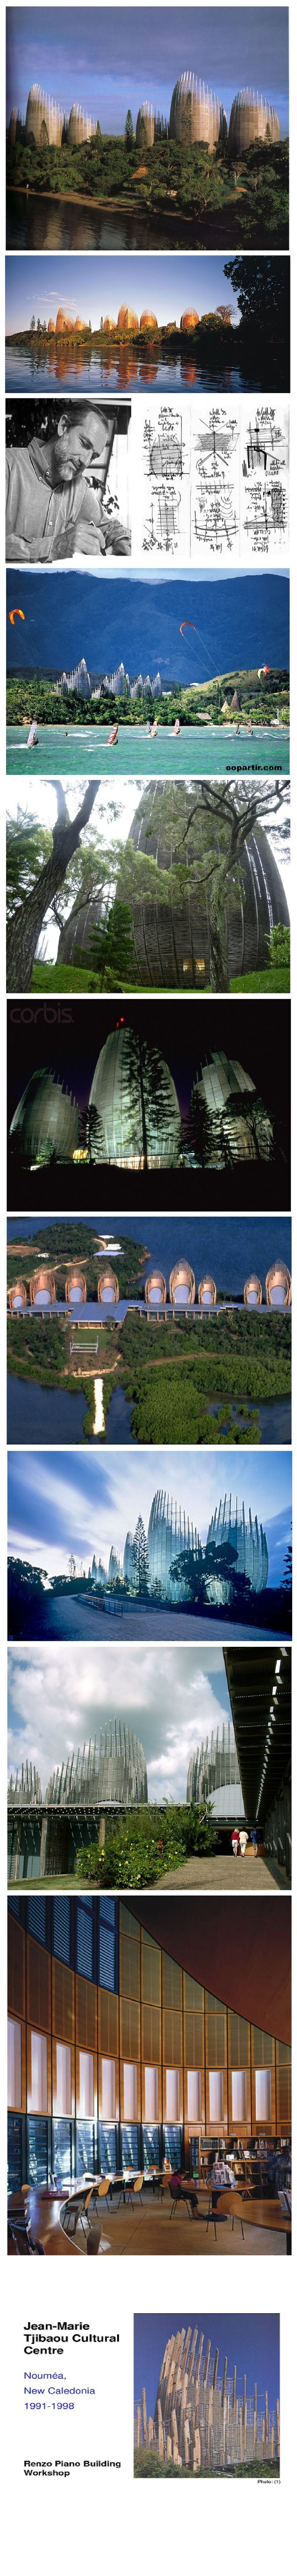 Renzo Piano's Jean-Marie Tjibaou Cultural Center On the narrow Tinu Peninsula, near Nouméa, capital of New Caledonia